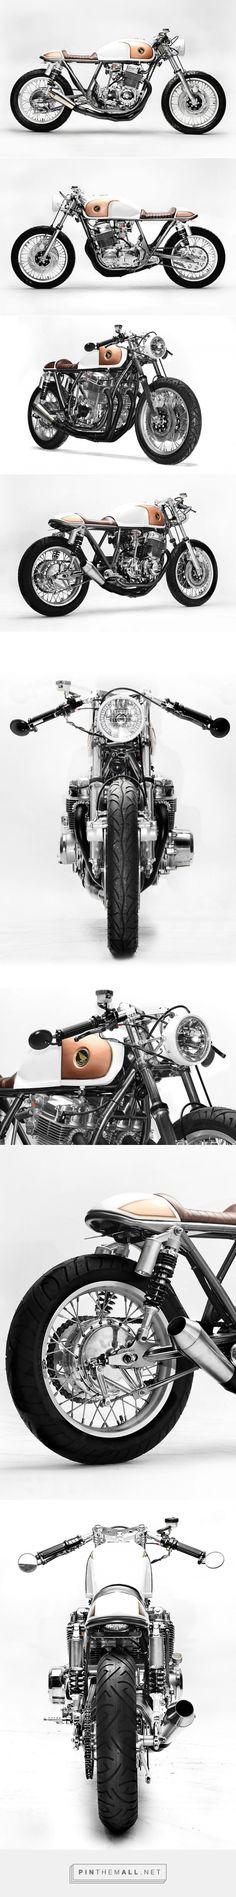 "PRECIOUS MENTAL. The ""Goldenrod"" Honda CB750 from Steel Bent Customs - Pipeburn.com - created via https://pinthemall.net"